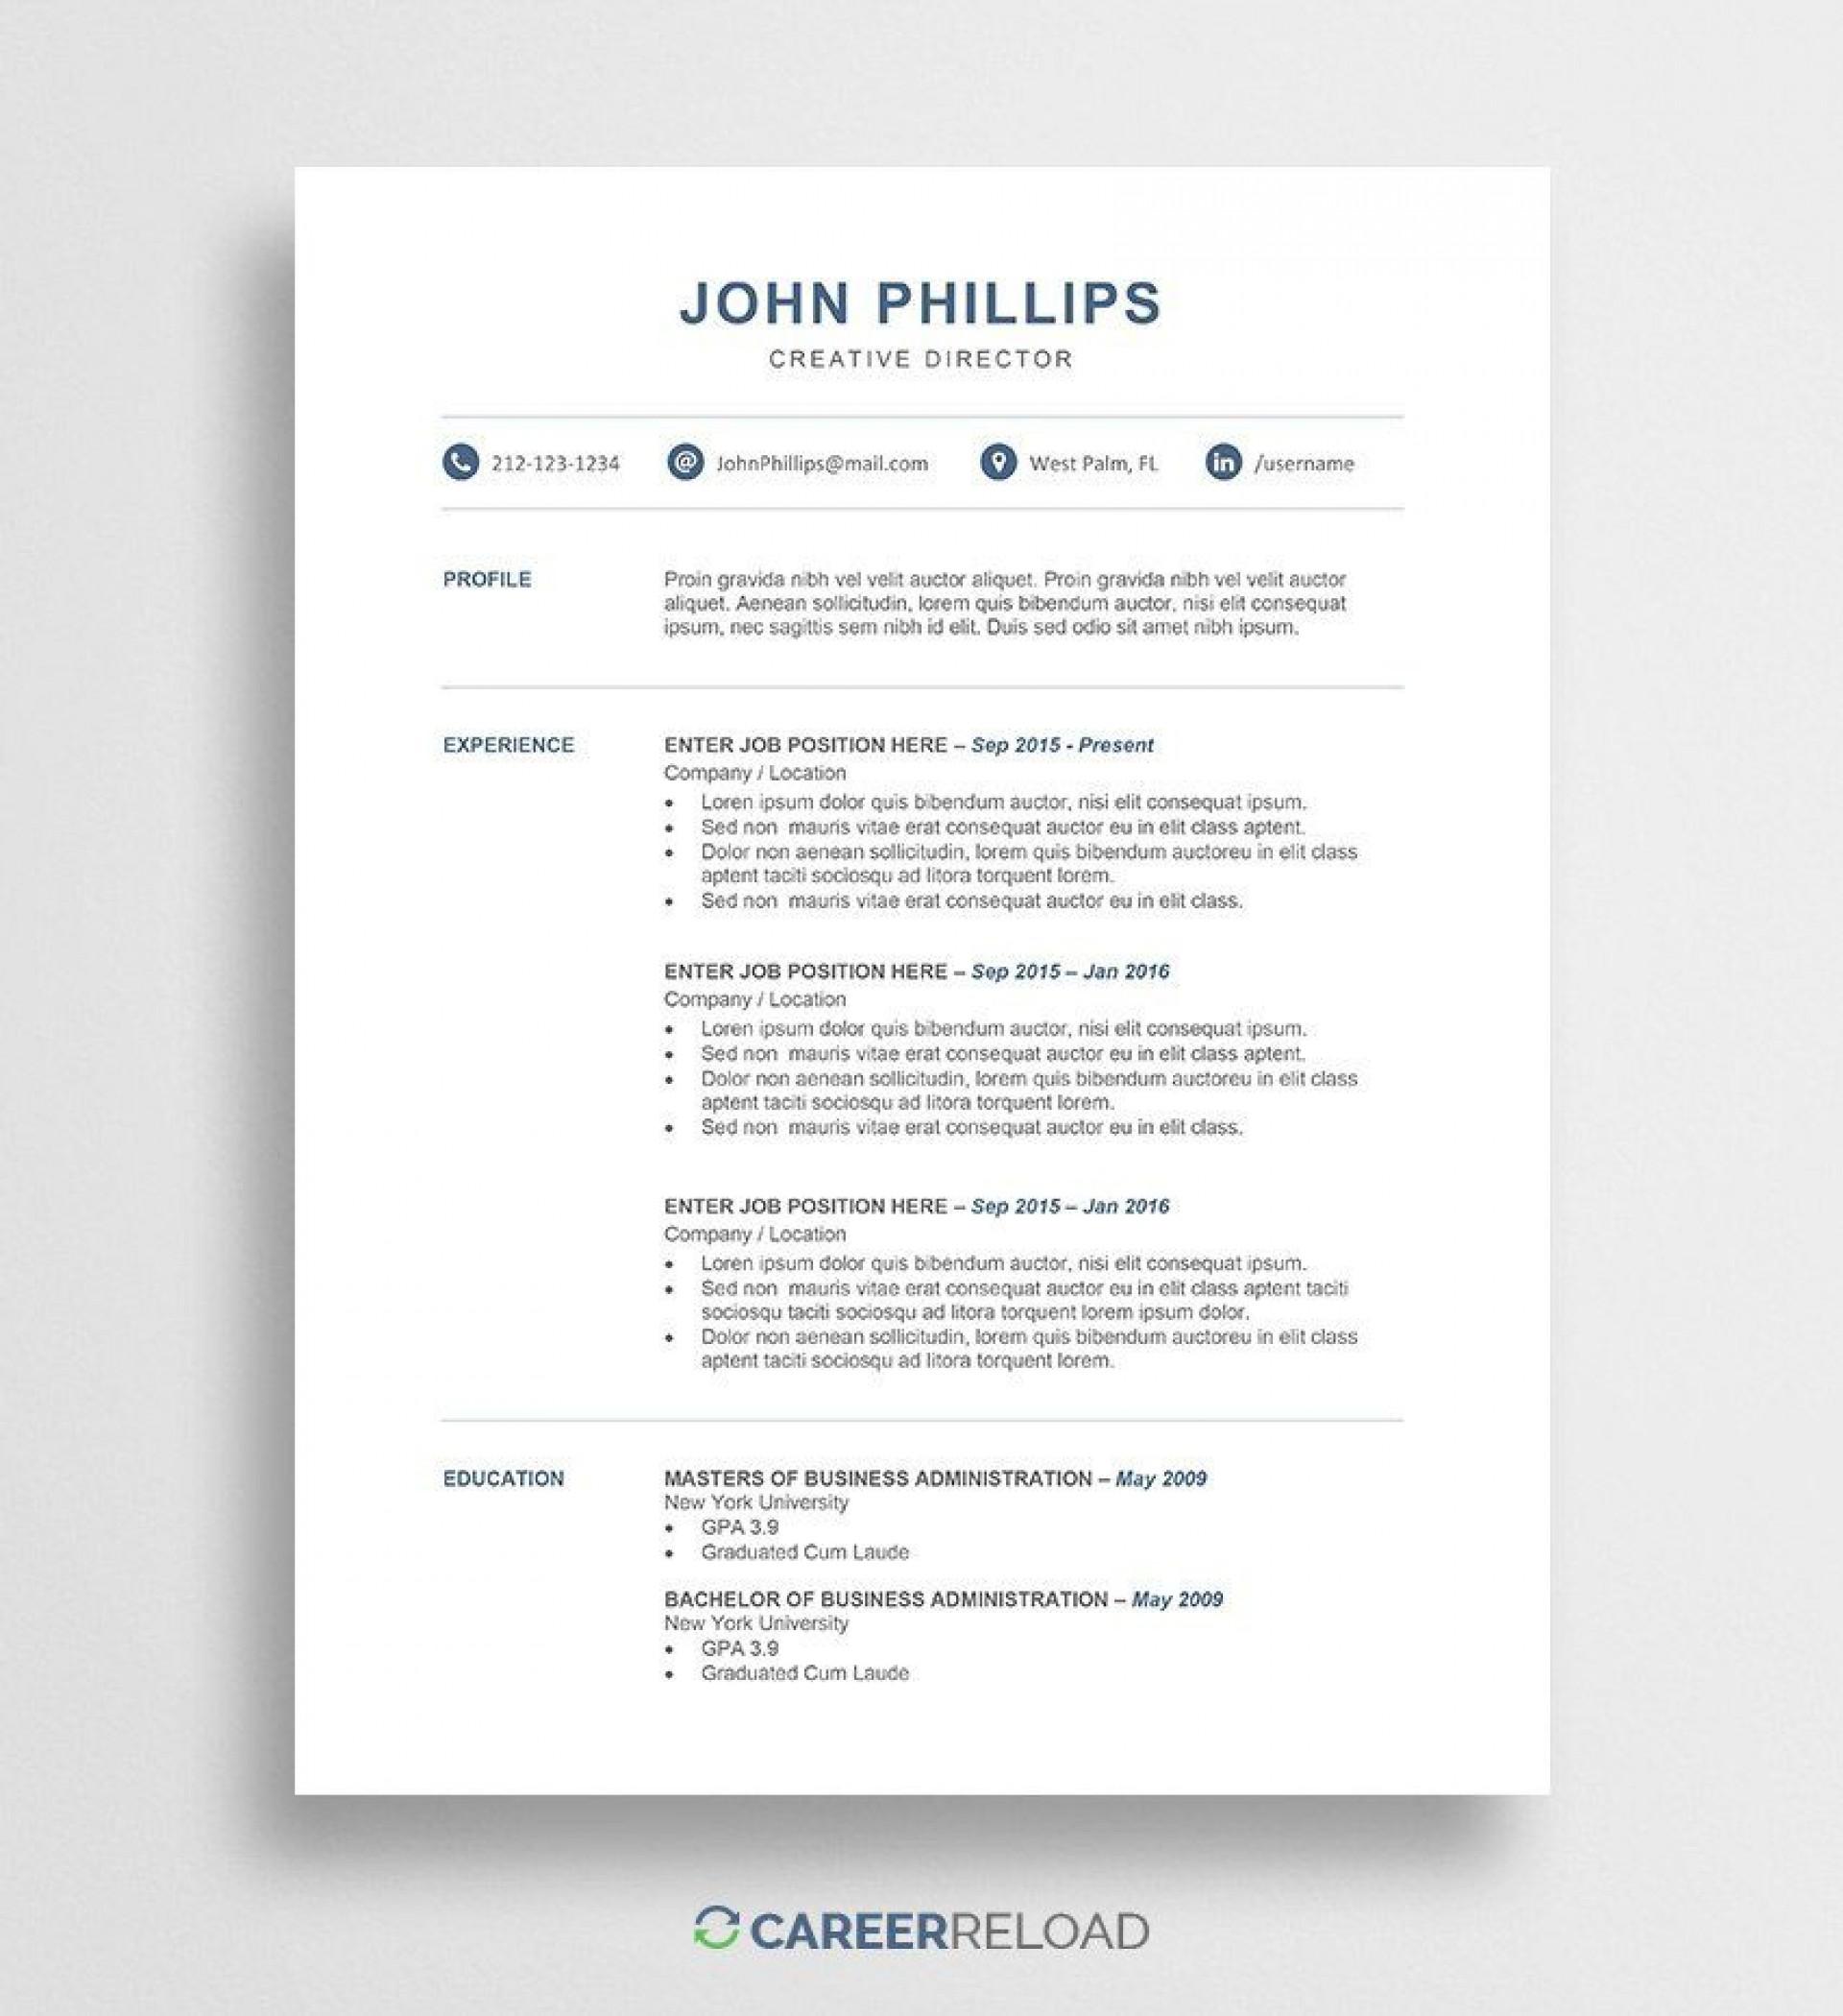 000 Stirring Resume Template Free Word Inspiration  Download 2020 Cv1920